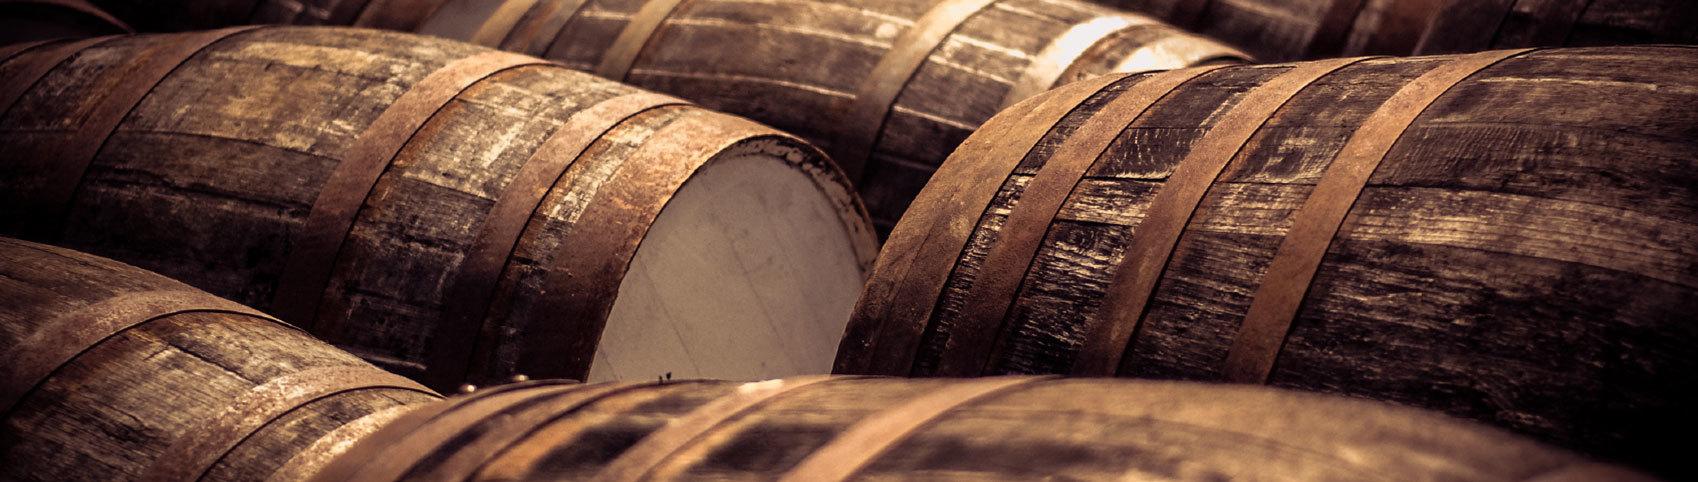 spirits_barrels.jpg